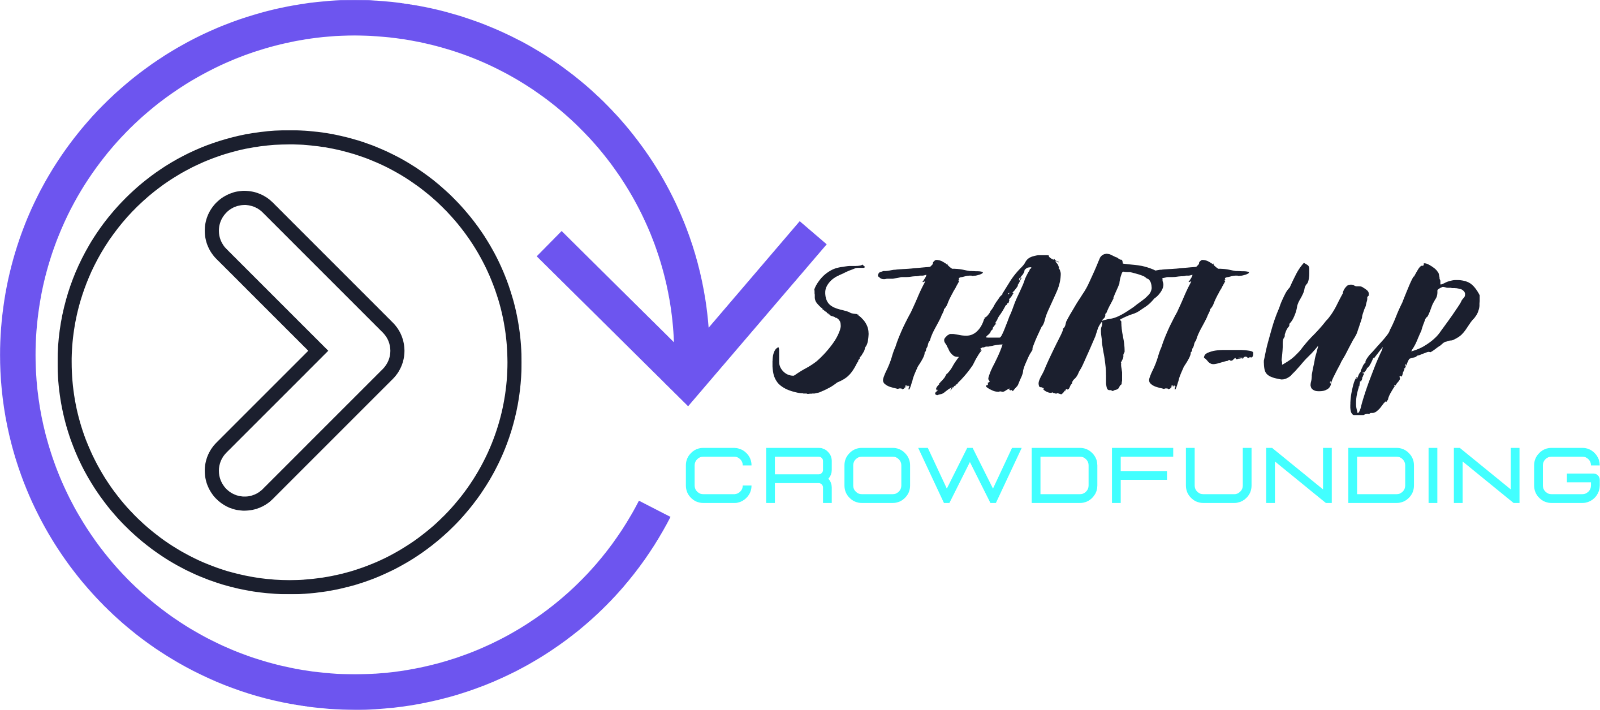 Start Up Crowdfunding